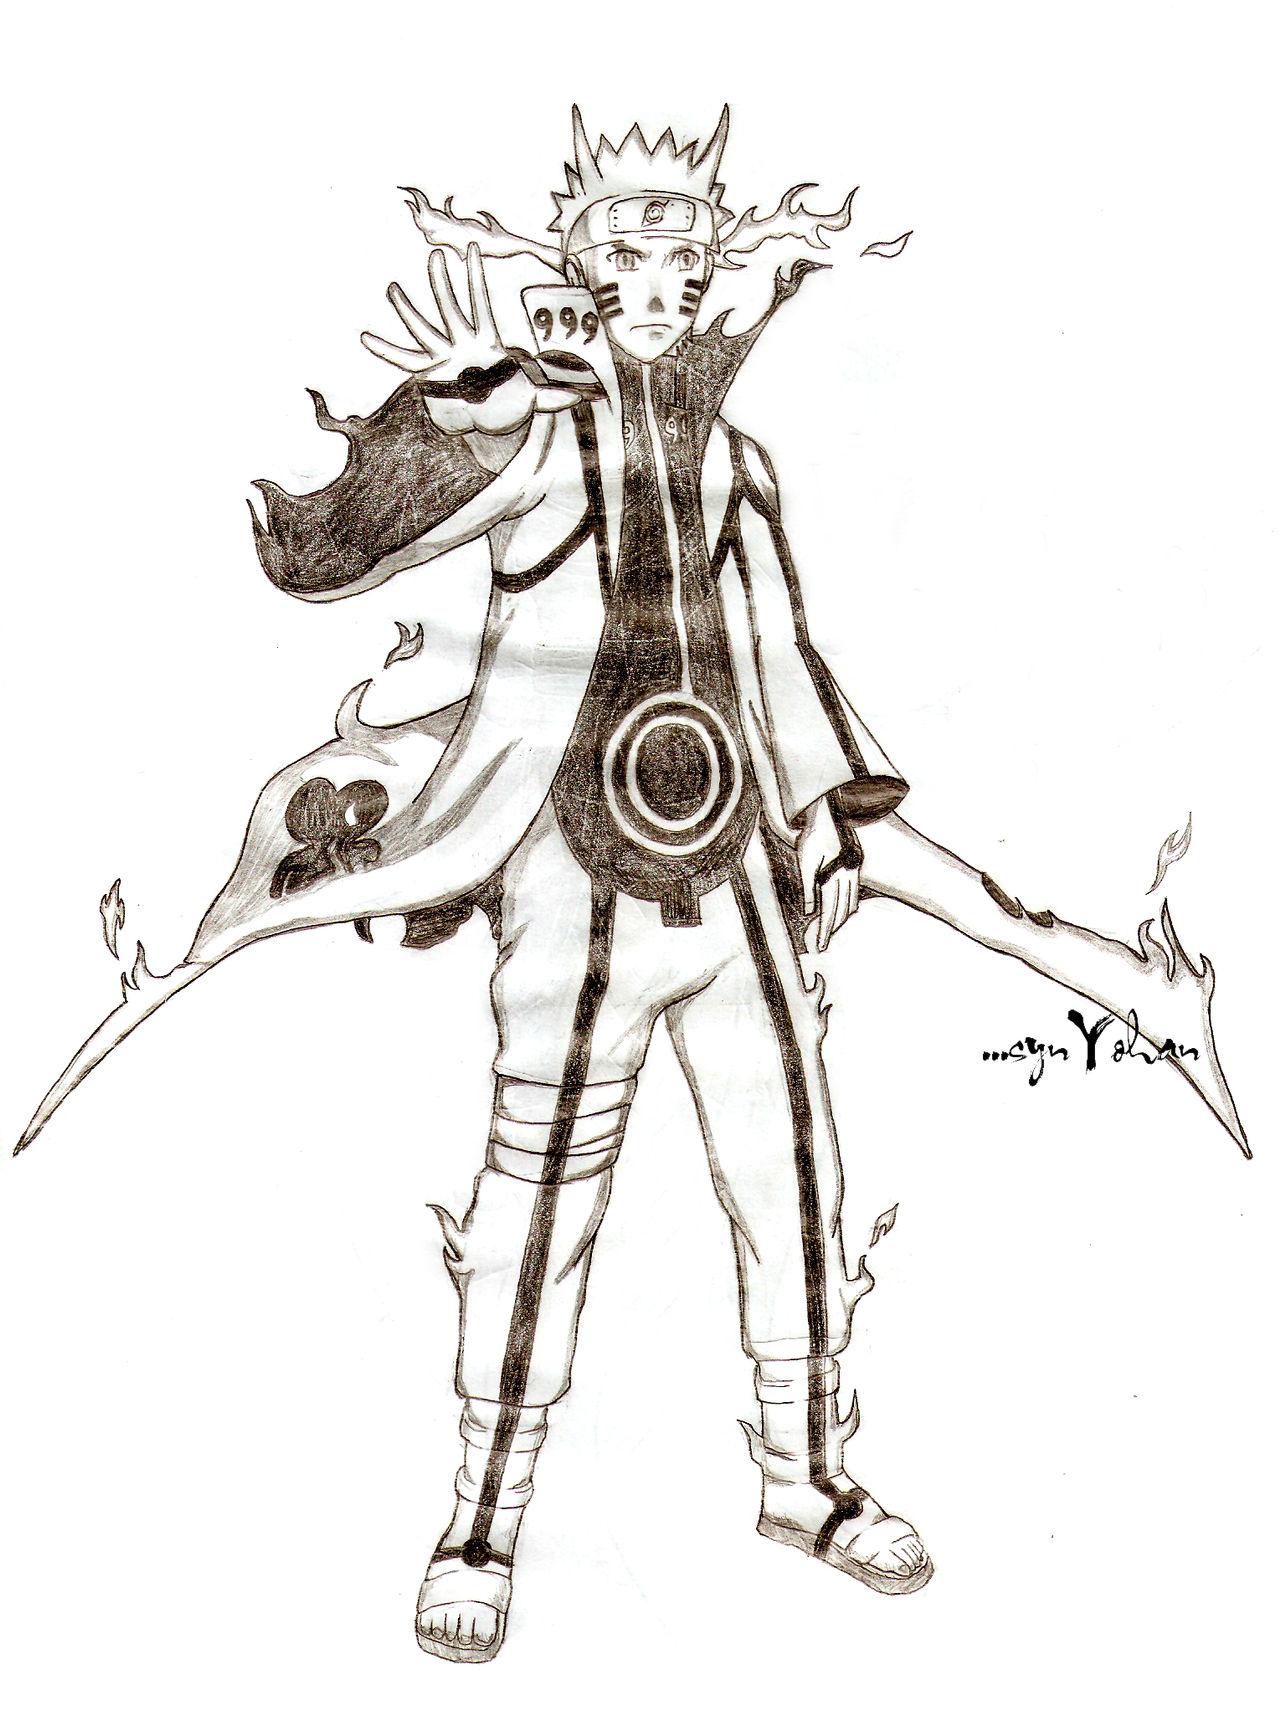 Naruto Nine Tails Chakra Mode Naruto Shippuuden By Synyohan On Deviantart